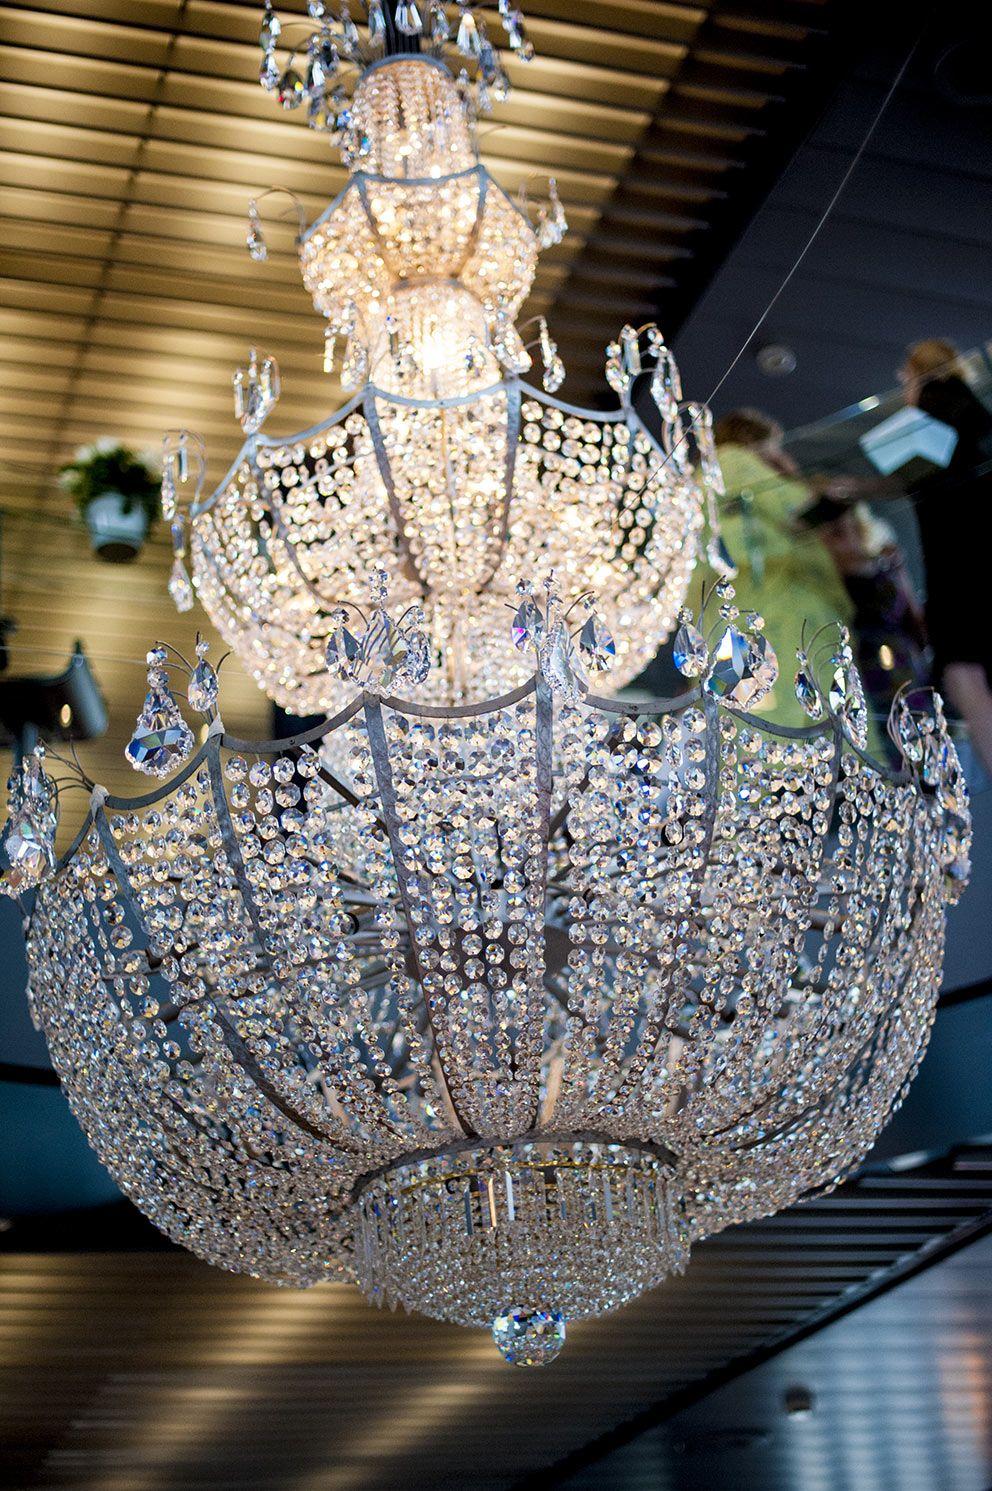 Queen elizabeth chandeliers to die for pty ltd of waterfalls queen elizabeth chandeliers to die for pty ltd aloadofball Choice Image